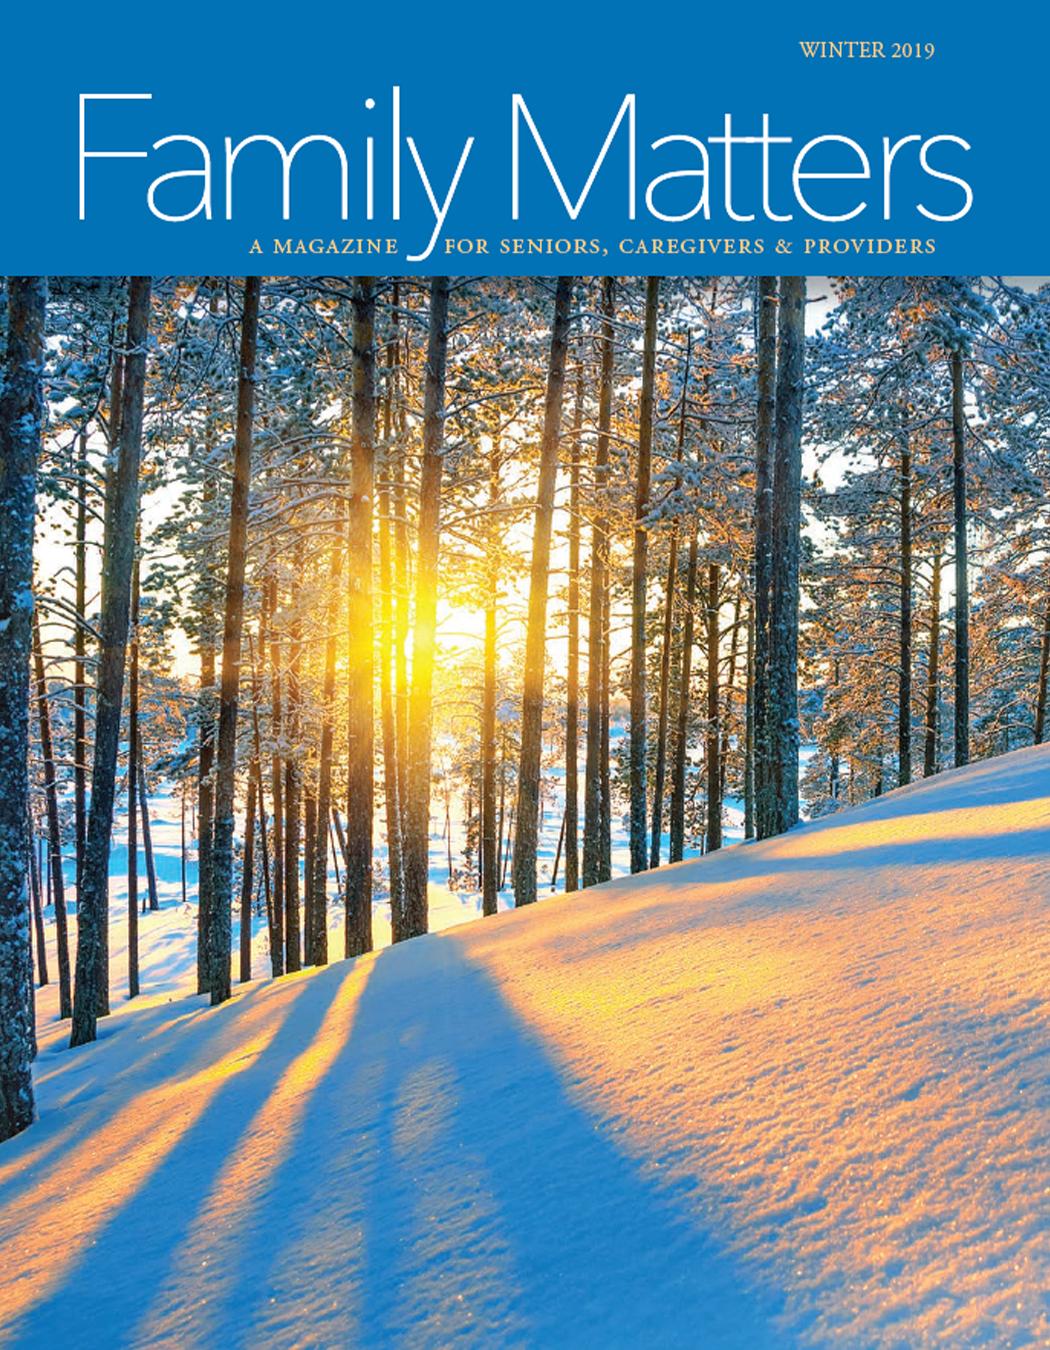 Family Matters Magazine (Winter 2019)